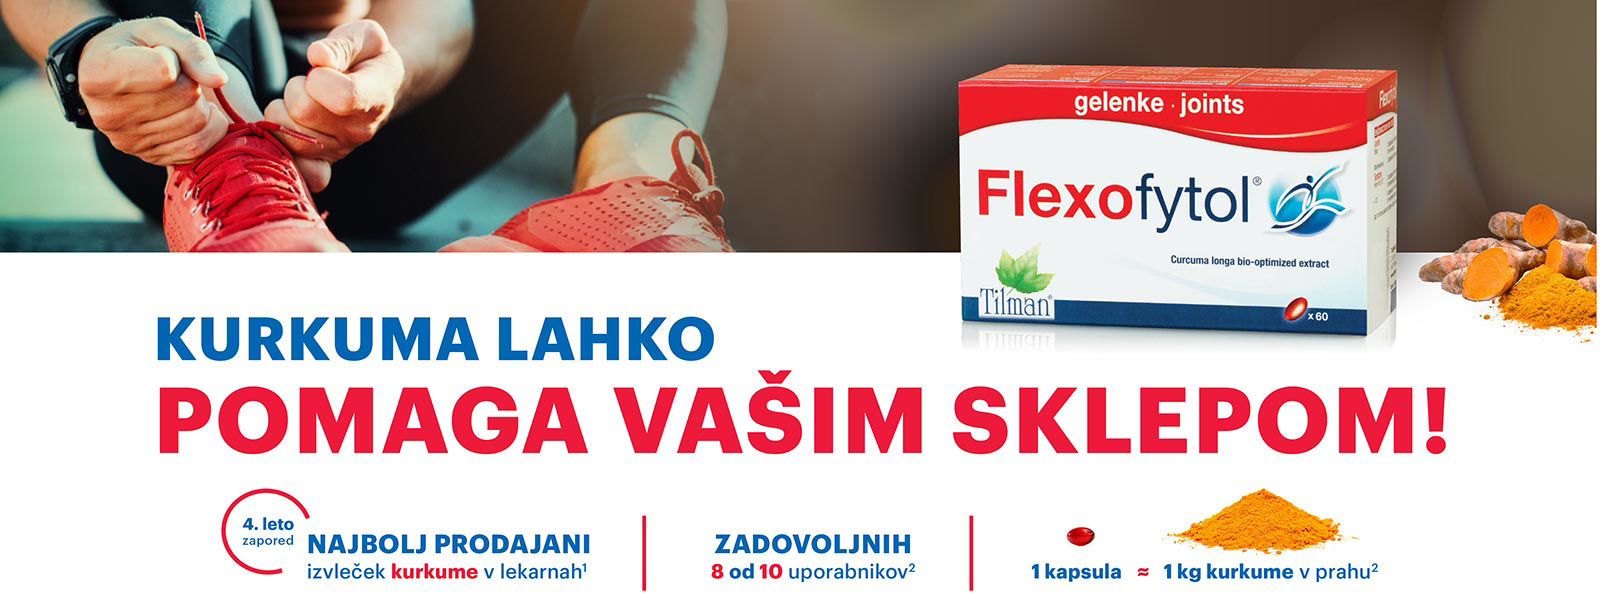 flexofytol-akcija